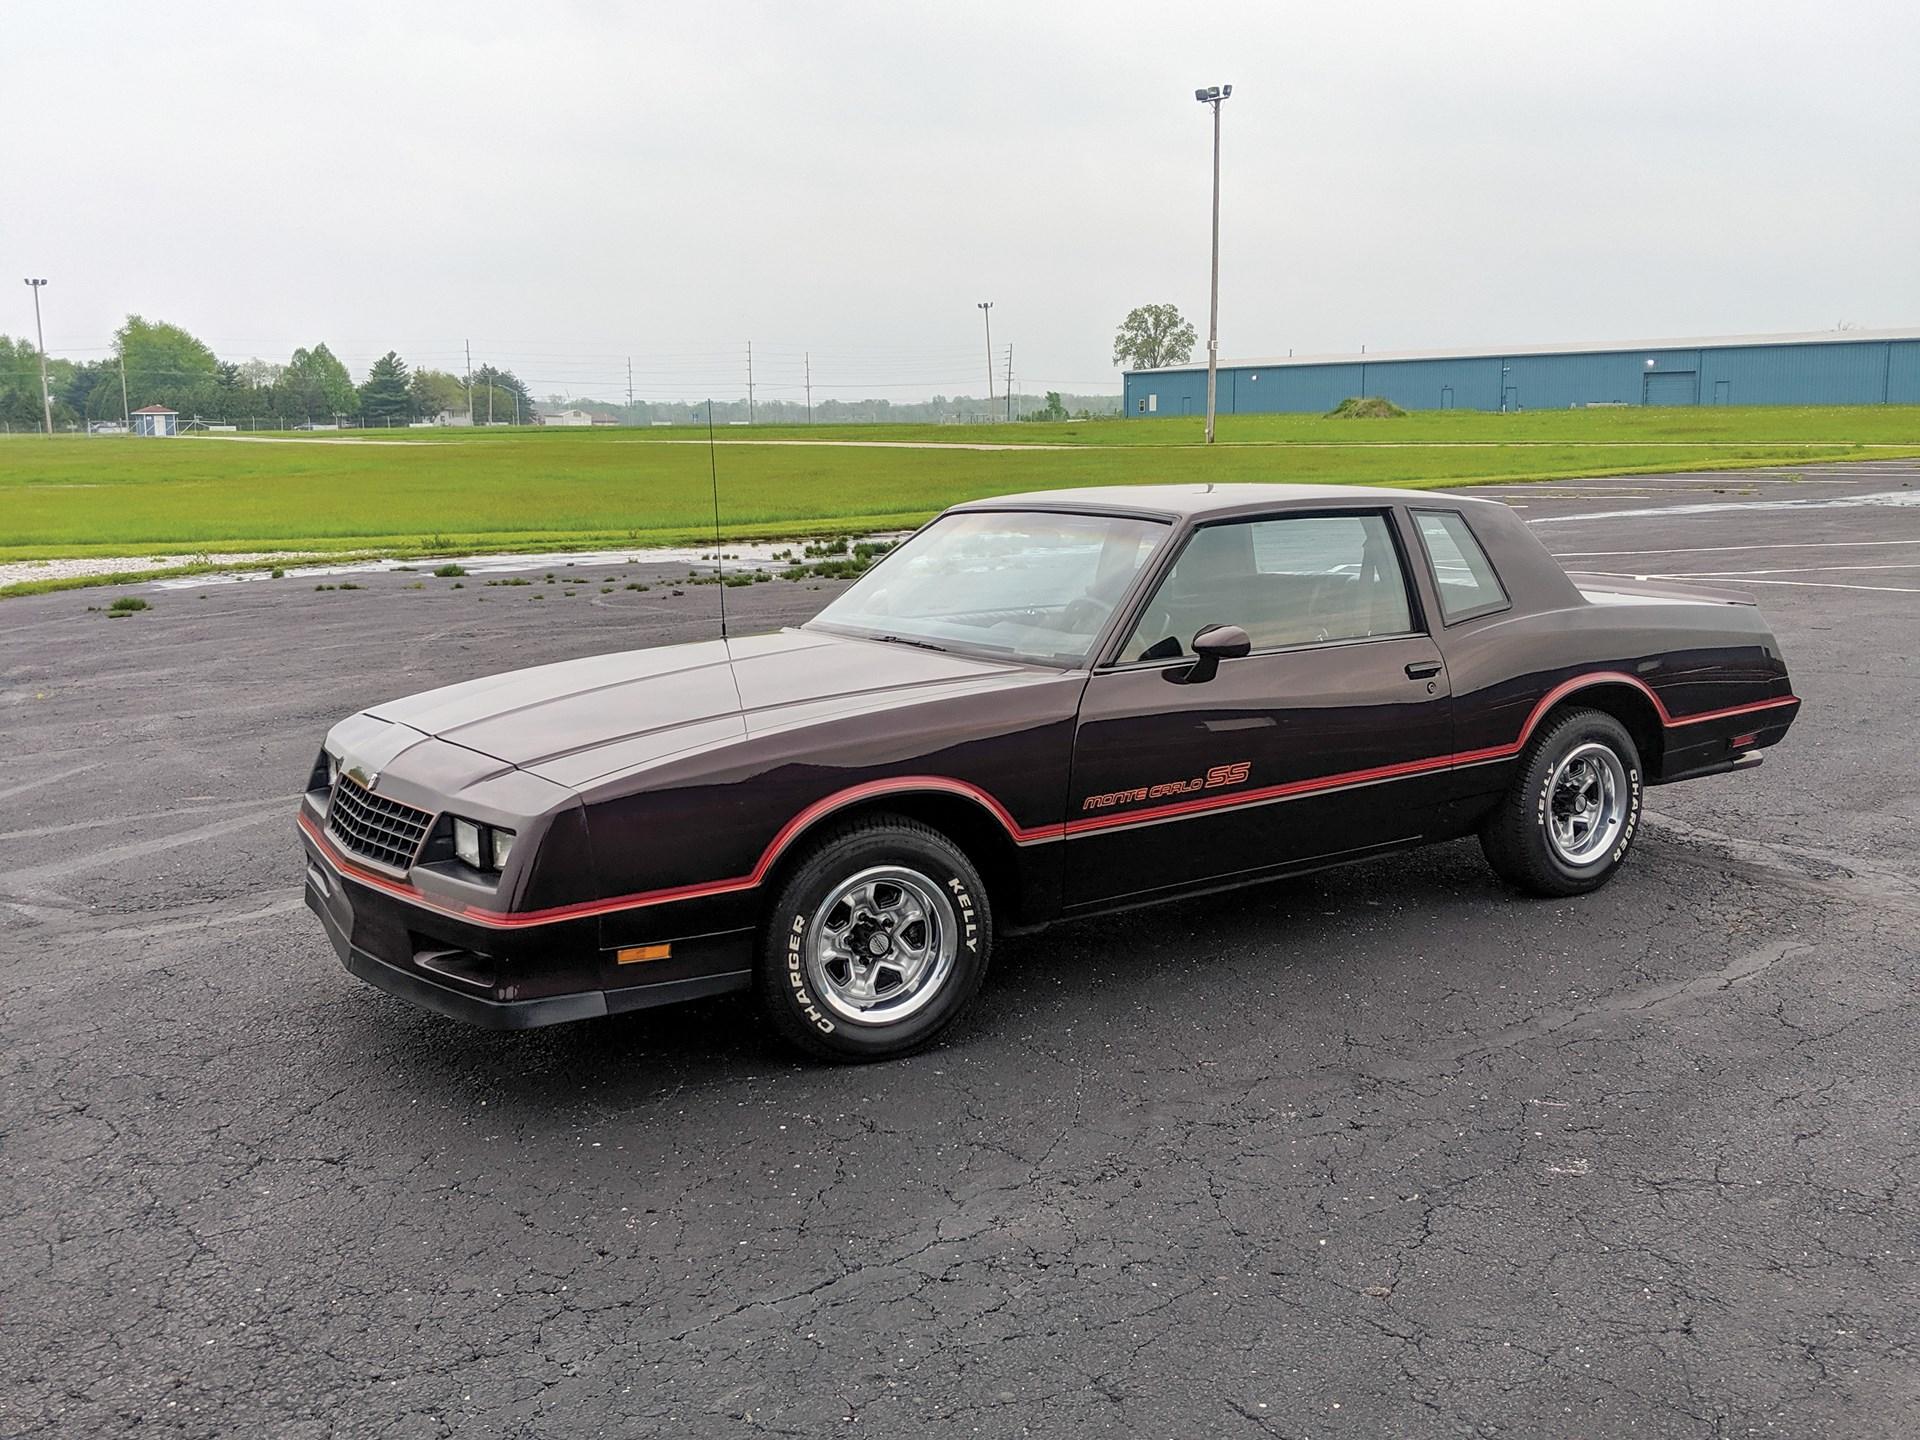 RM Sotheby's - 1985 Chevrolet Monte Carlo SS | Auburn ...